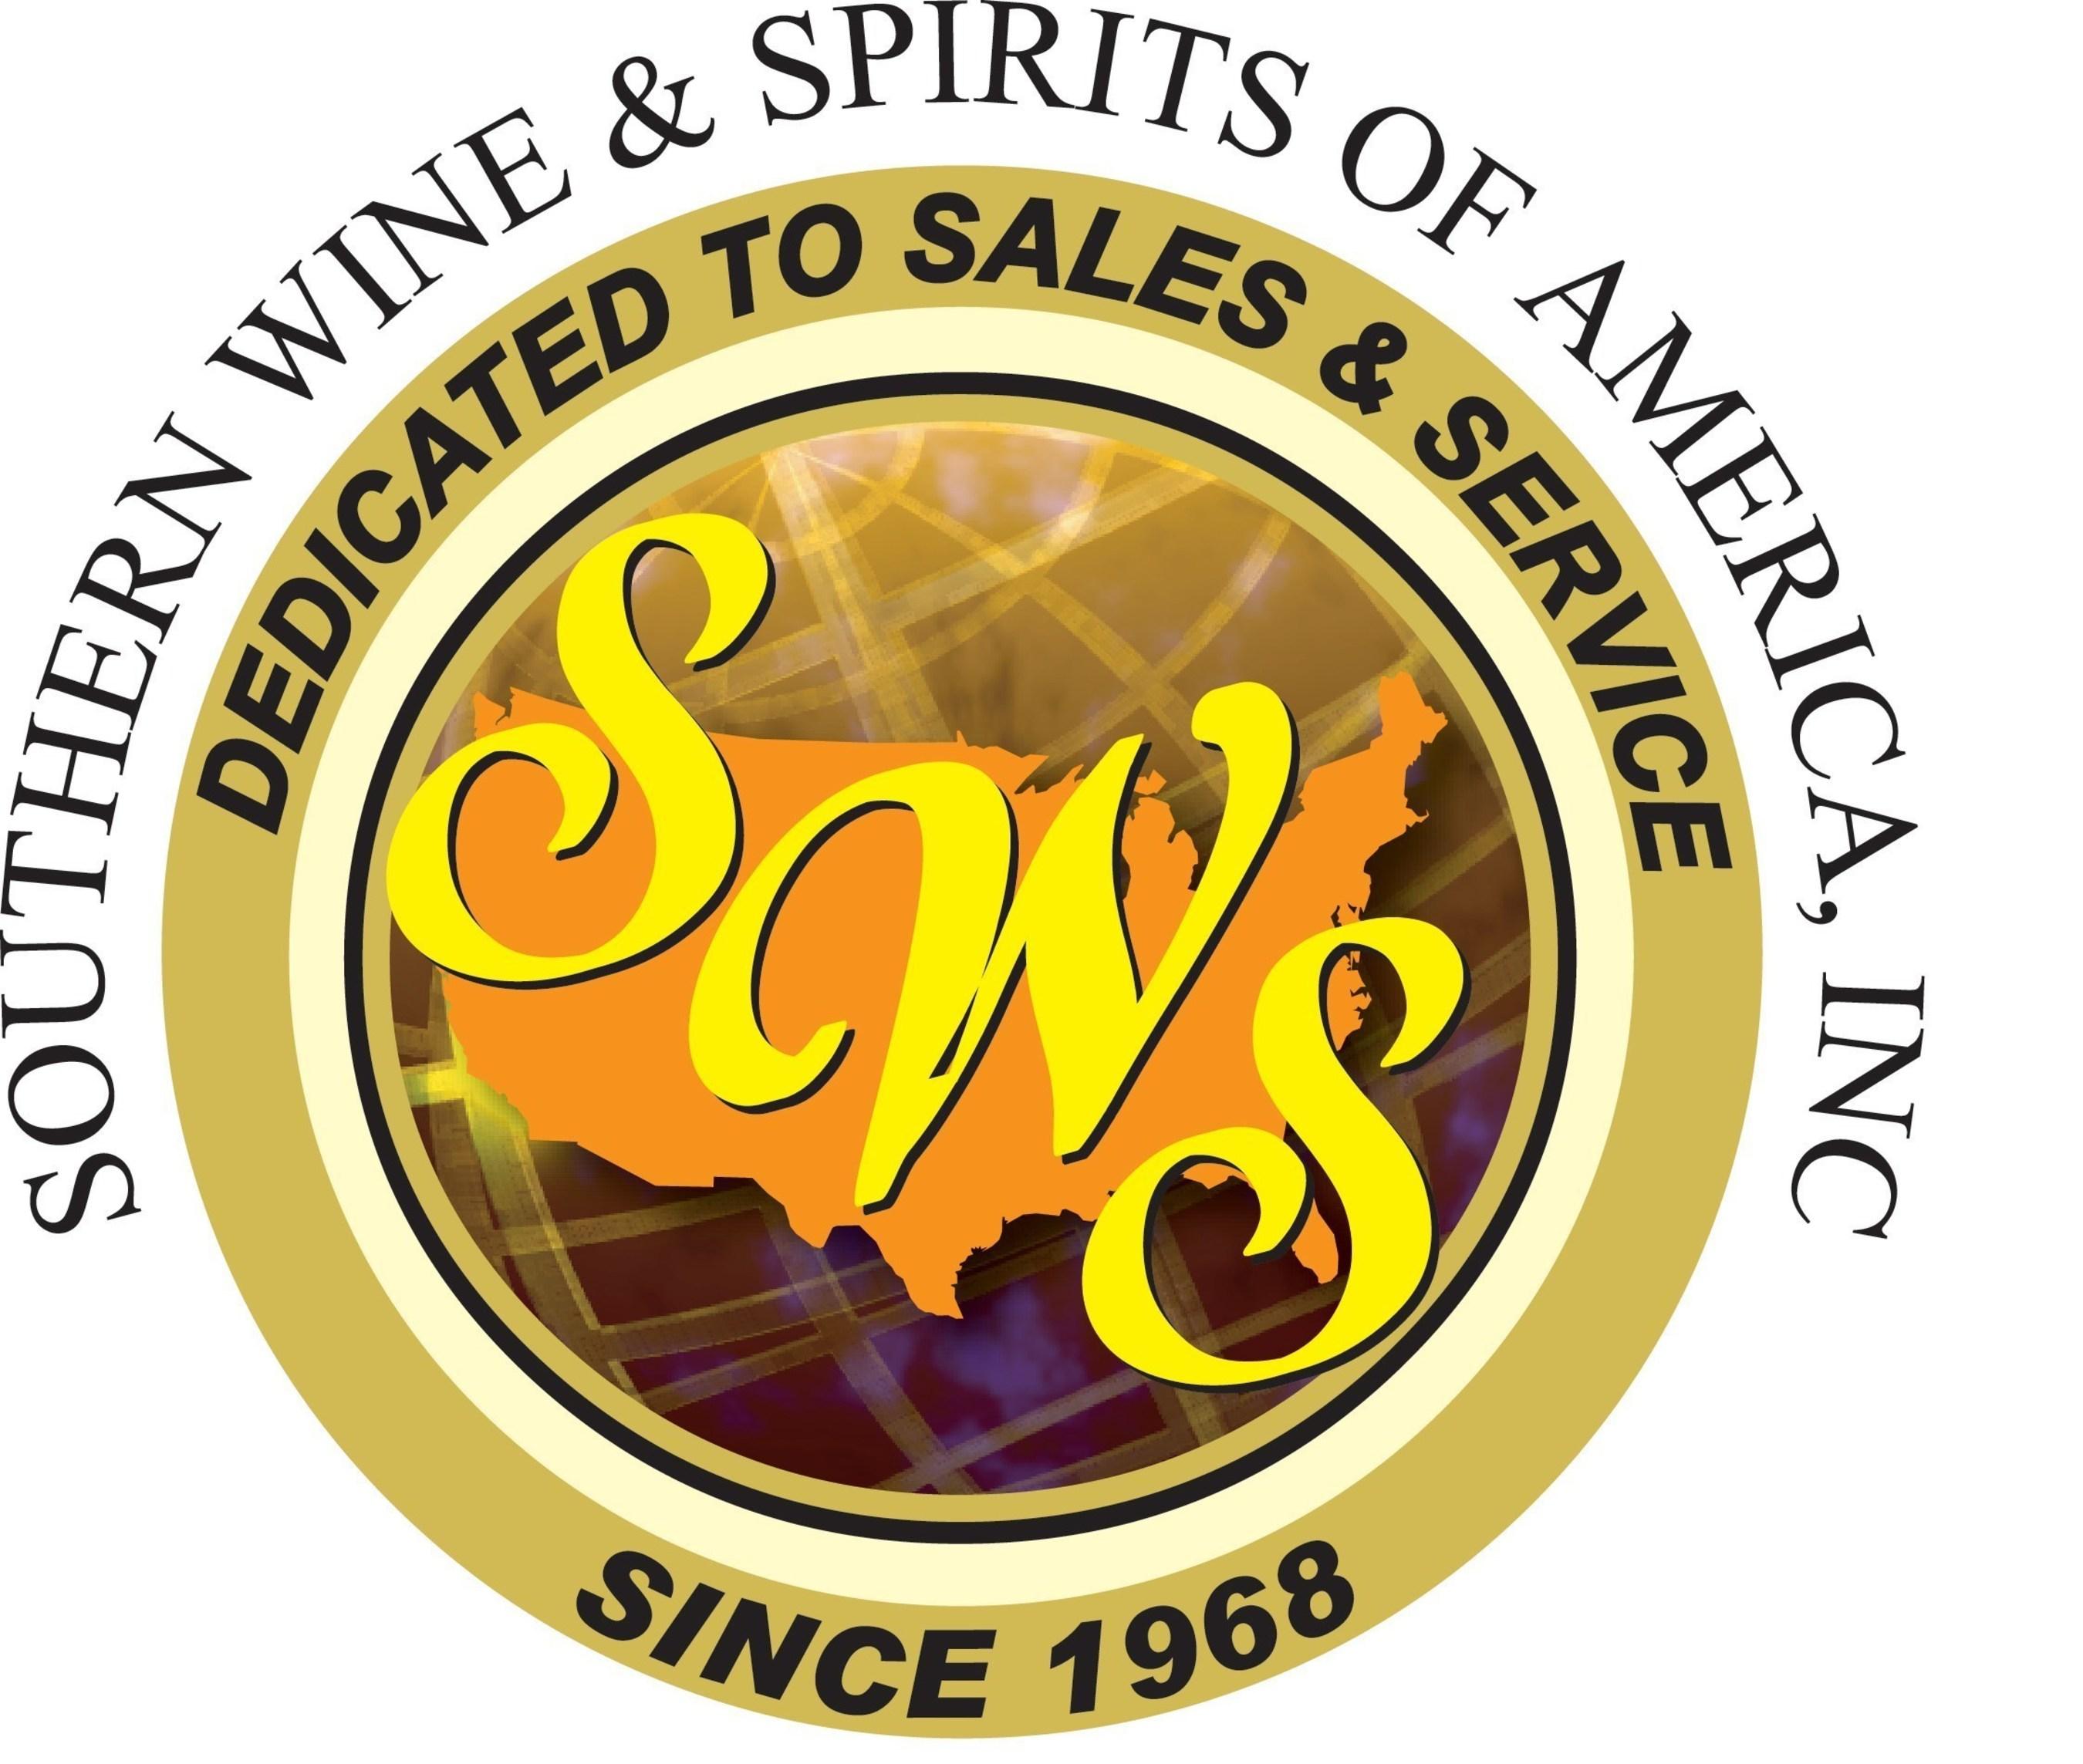 Southern Wine & Spirits of Florida Announces New Artisanal Fine Wine